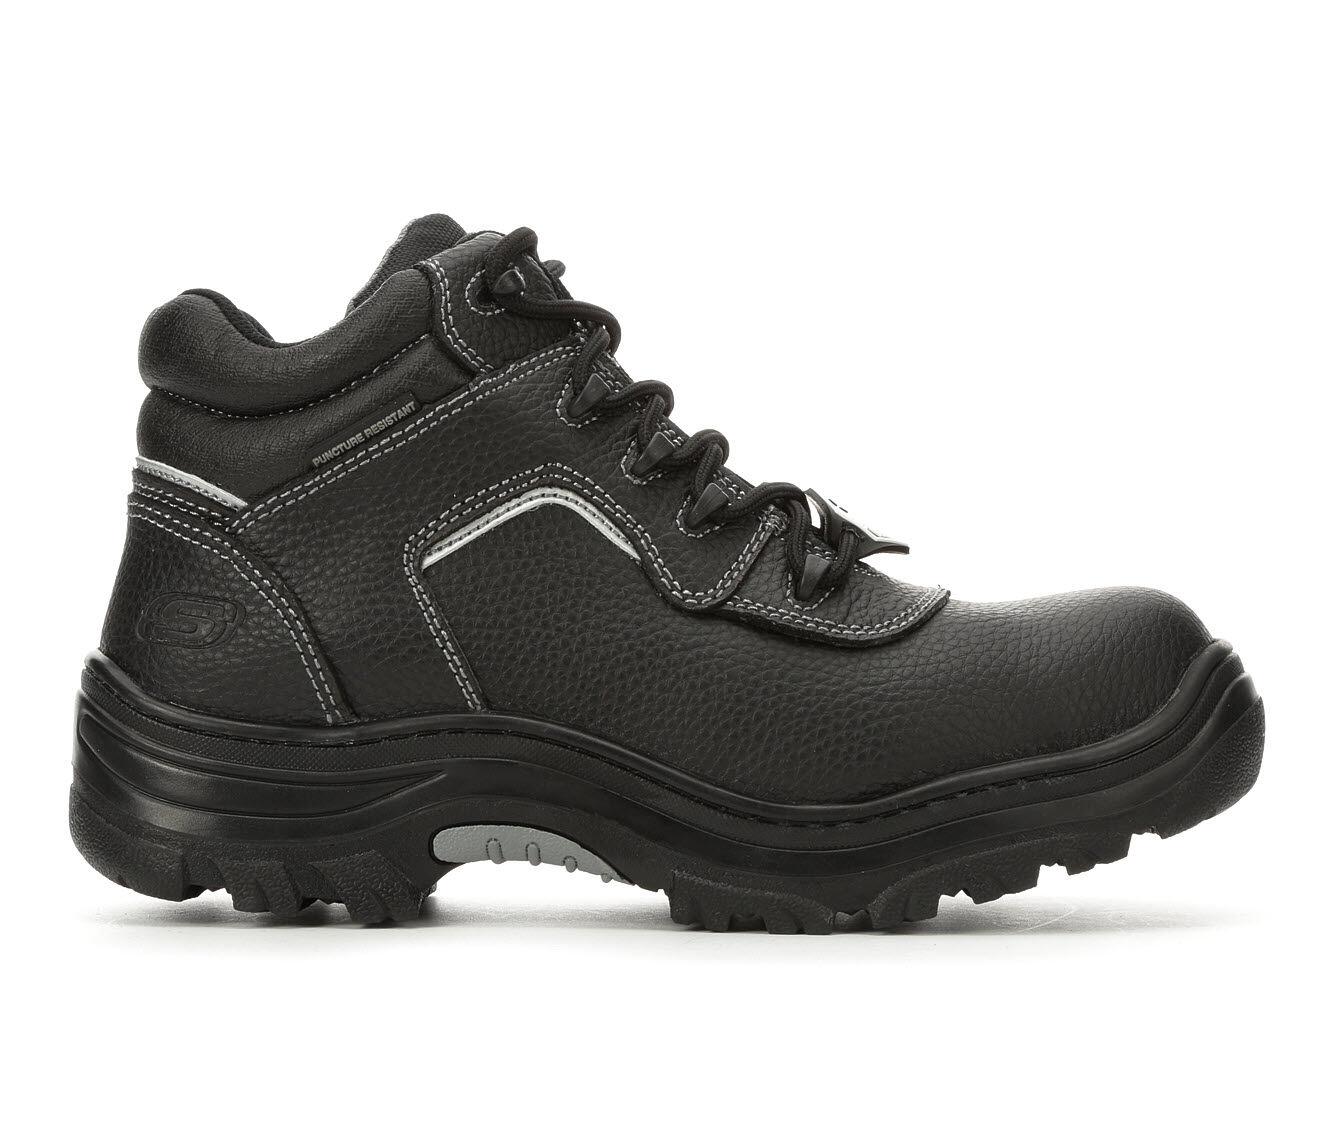 Men's Skechers Work Workshire Burgin Sosder 77144 Work Boots Black